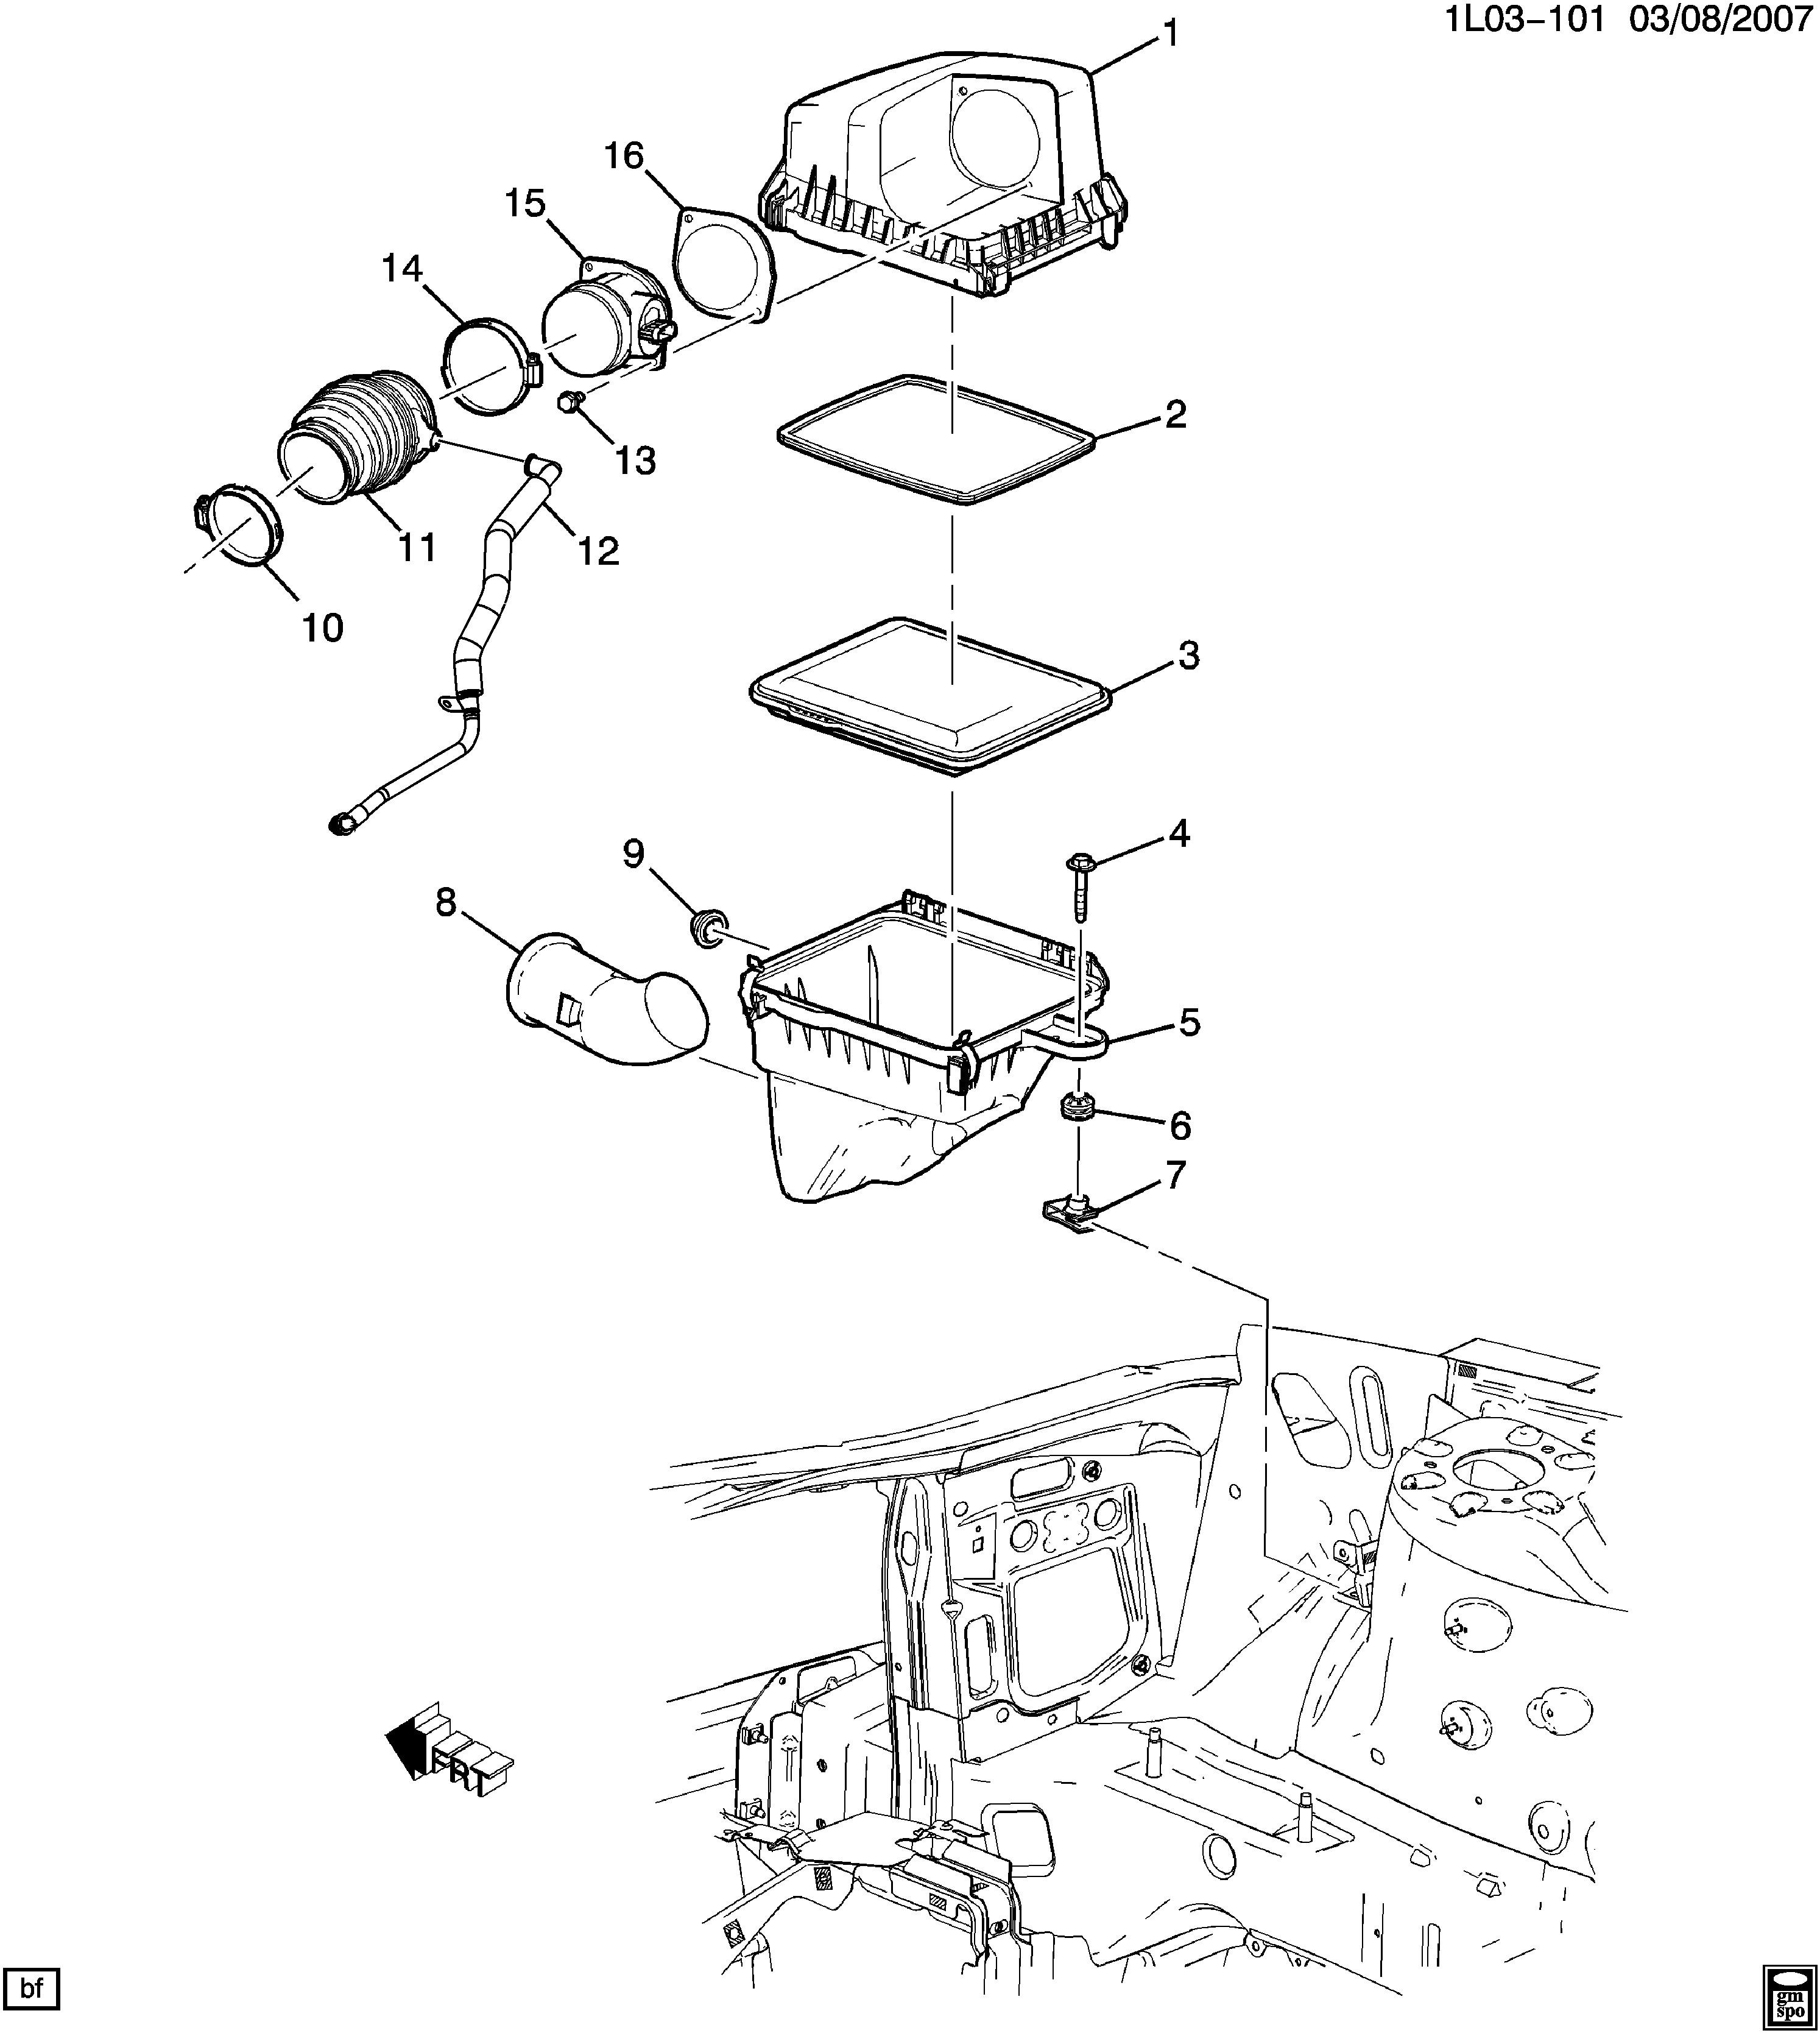 Air Intake System Diagram Equinox Air Intake System Chevrolet Epc Line Nemiga Of Air Intake System Diagram